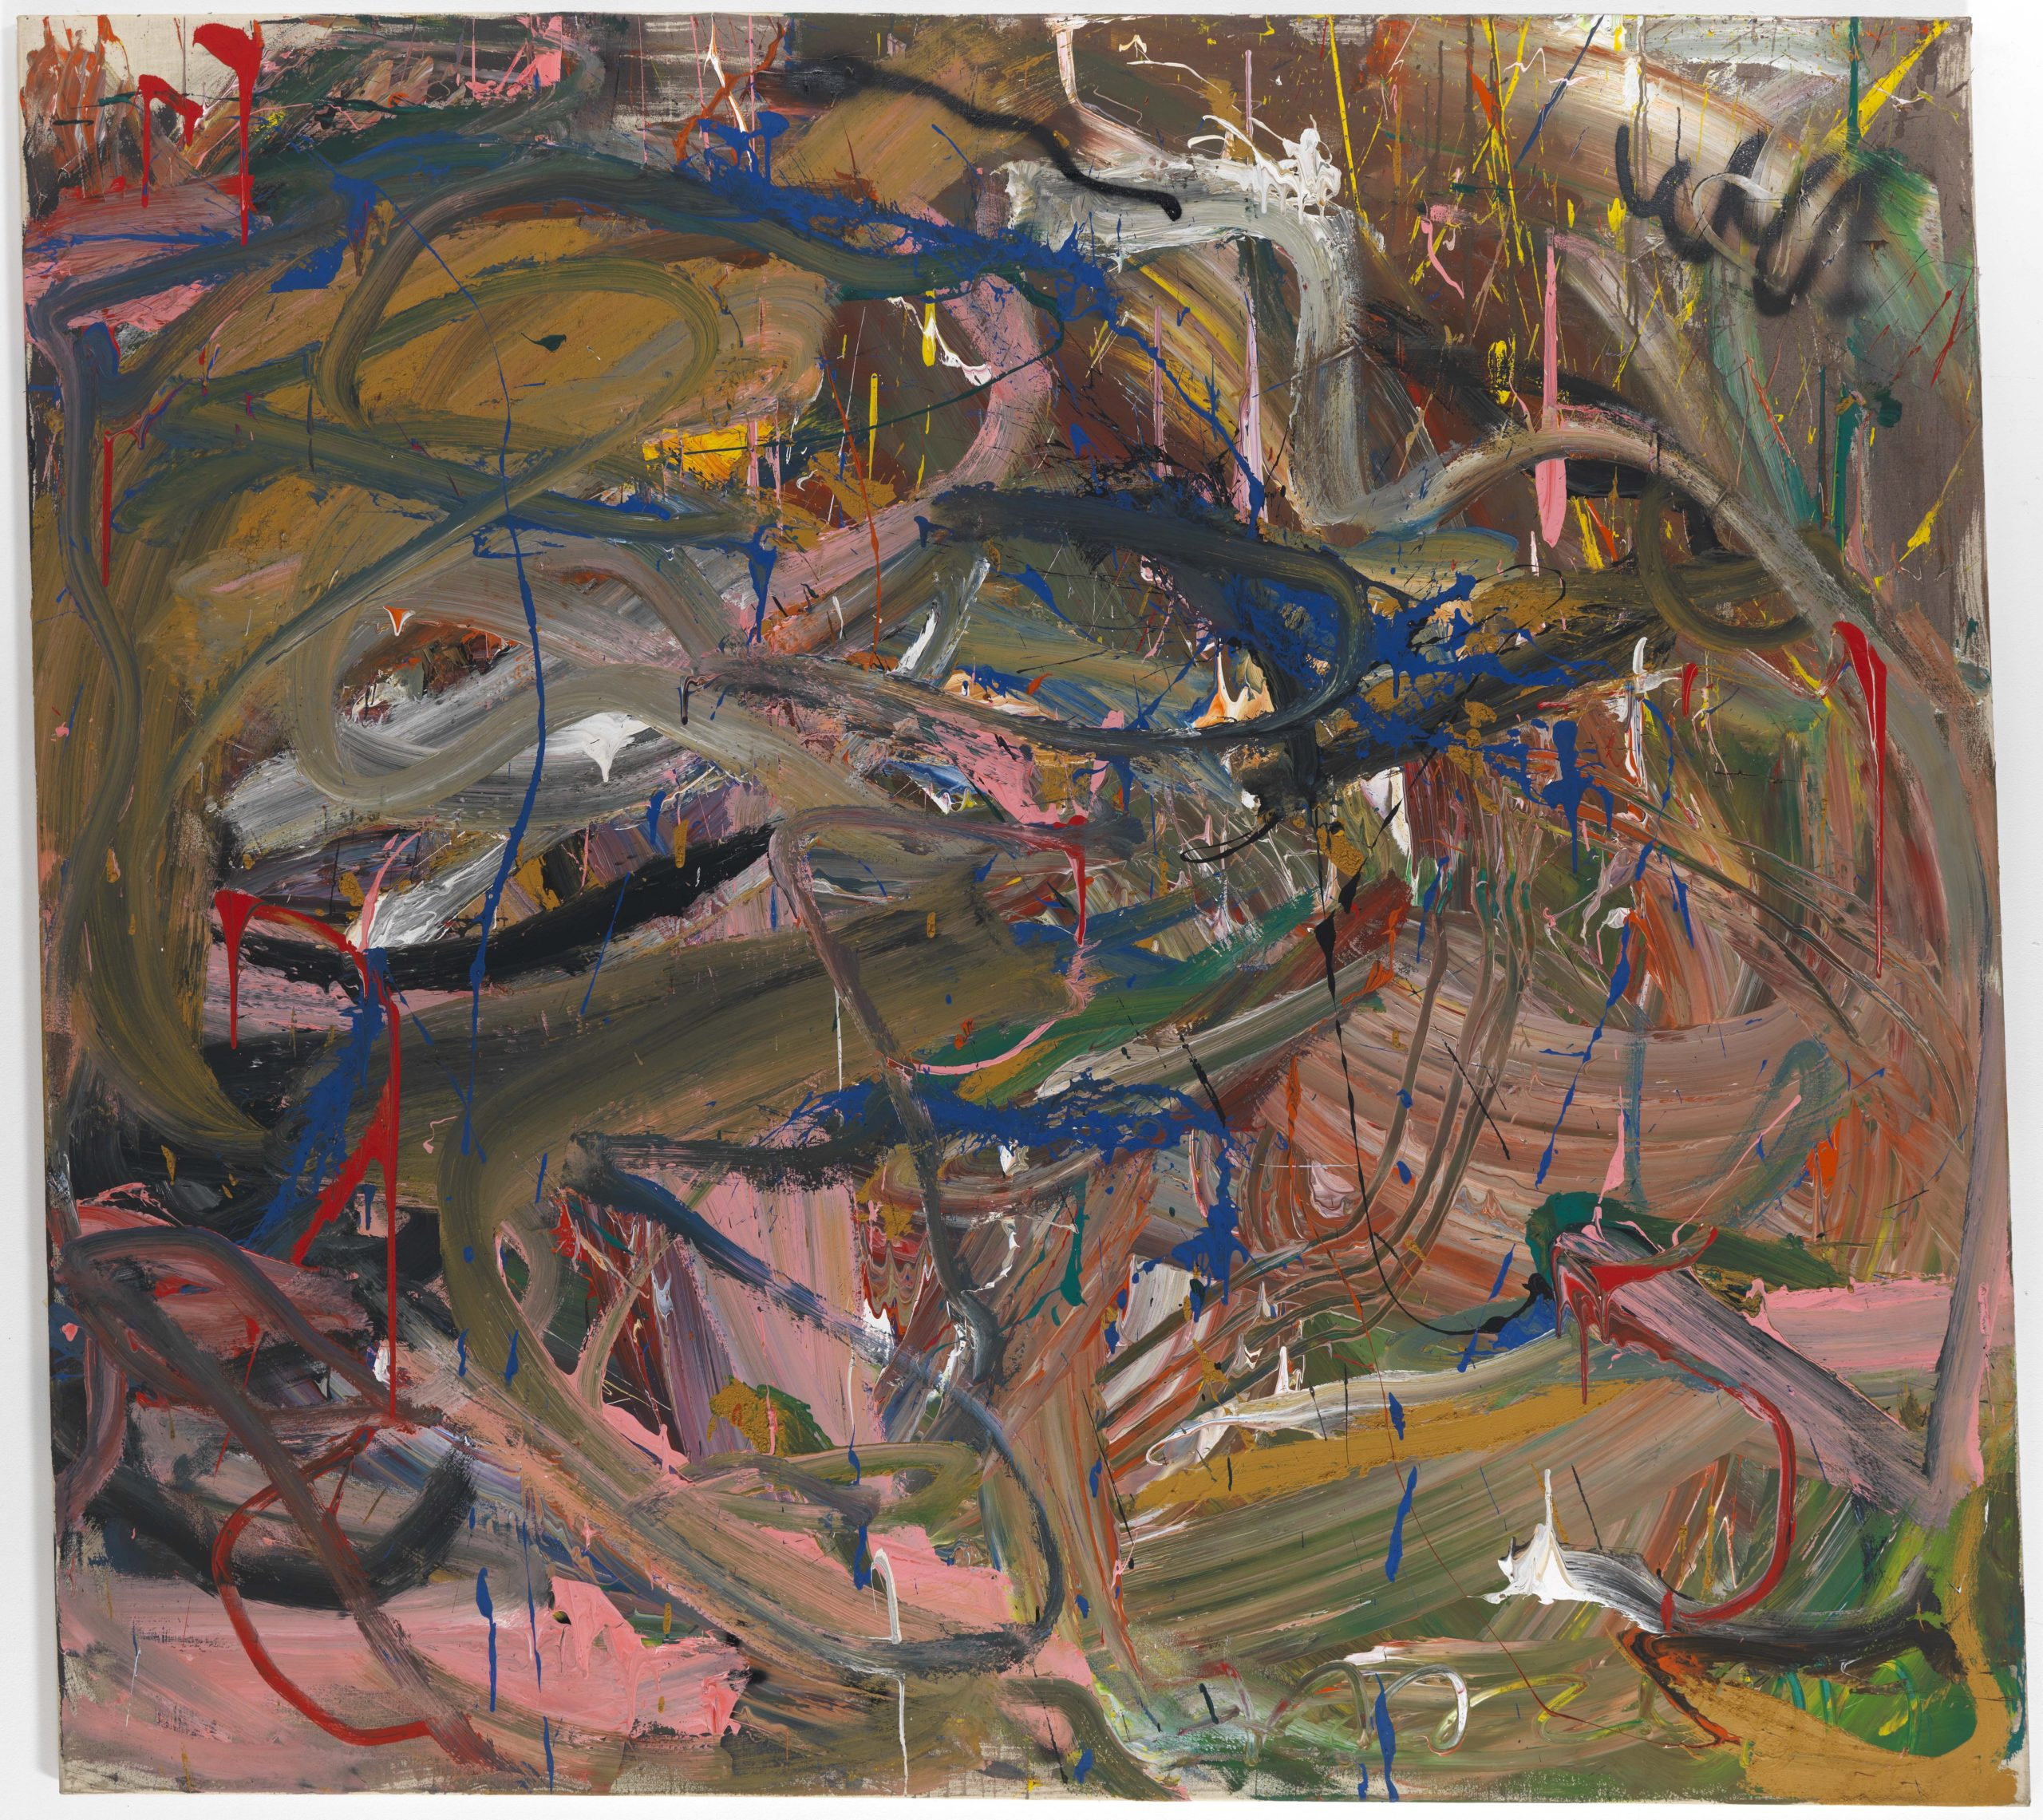 Reinhard Pods, Untitled (will), 1981, oil on canvas, 200 x 220.3 cm